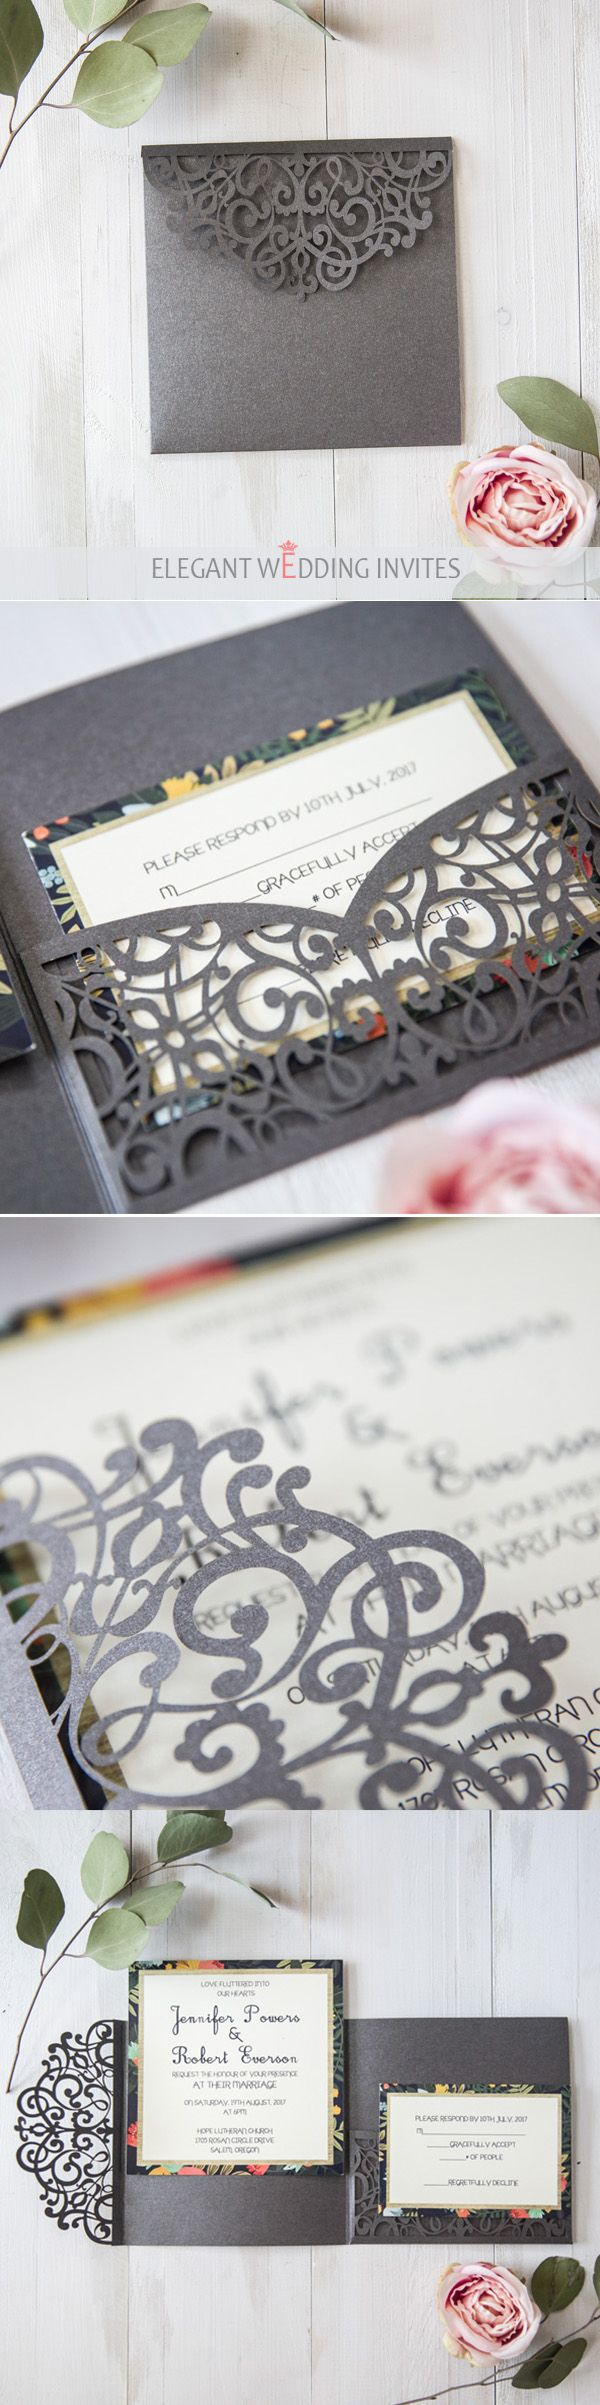 latest dark grey floral laser cut pocket wedding invitations#weddinginvitations #ElegantWeddingInvites